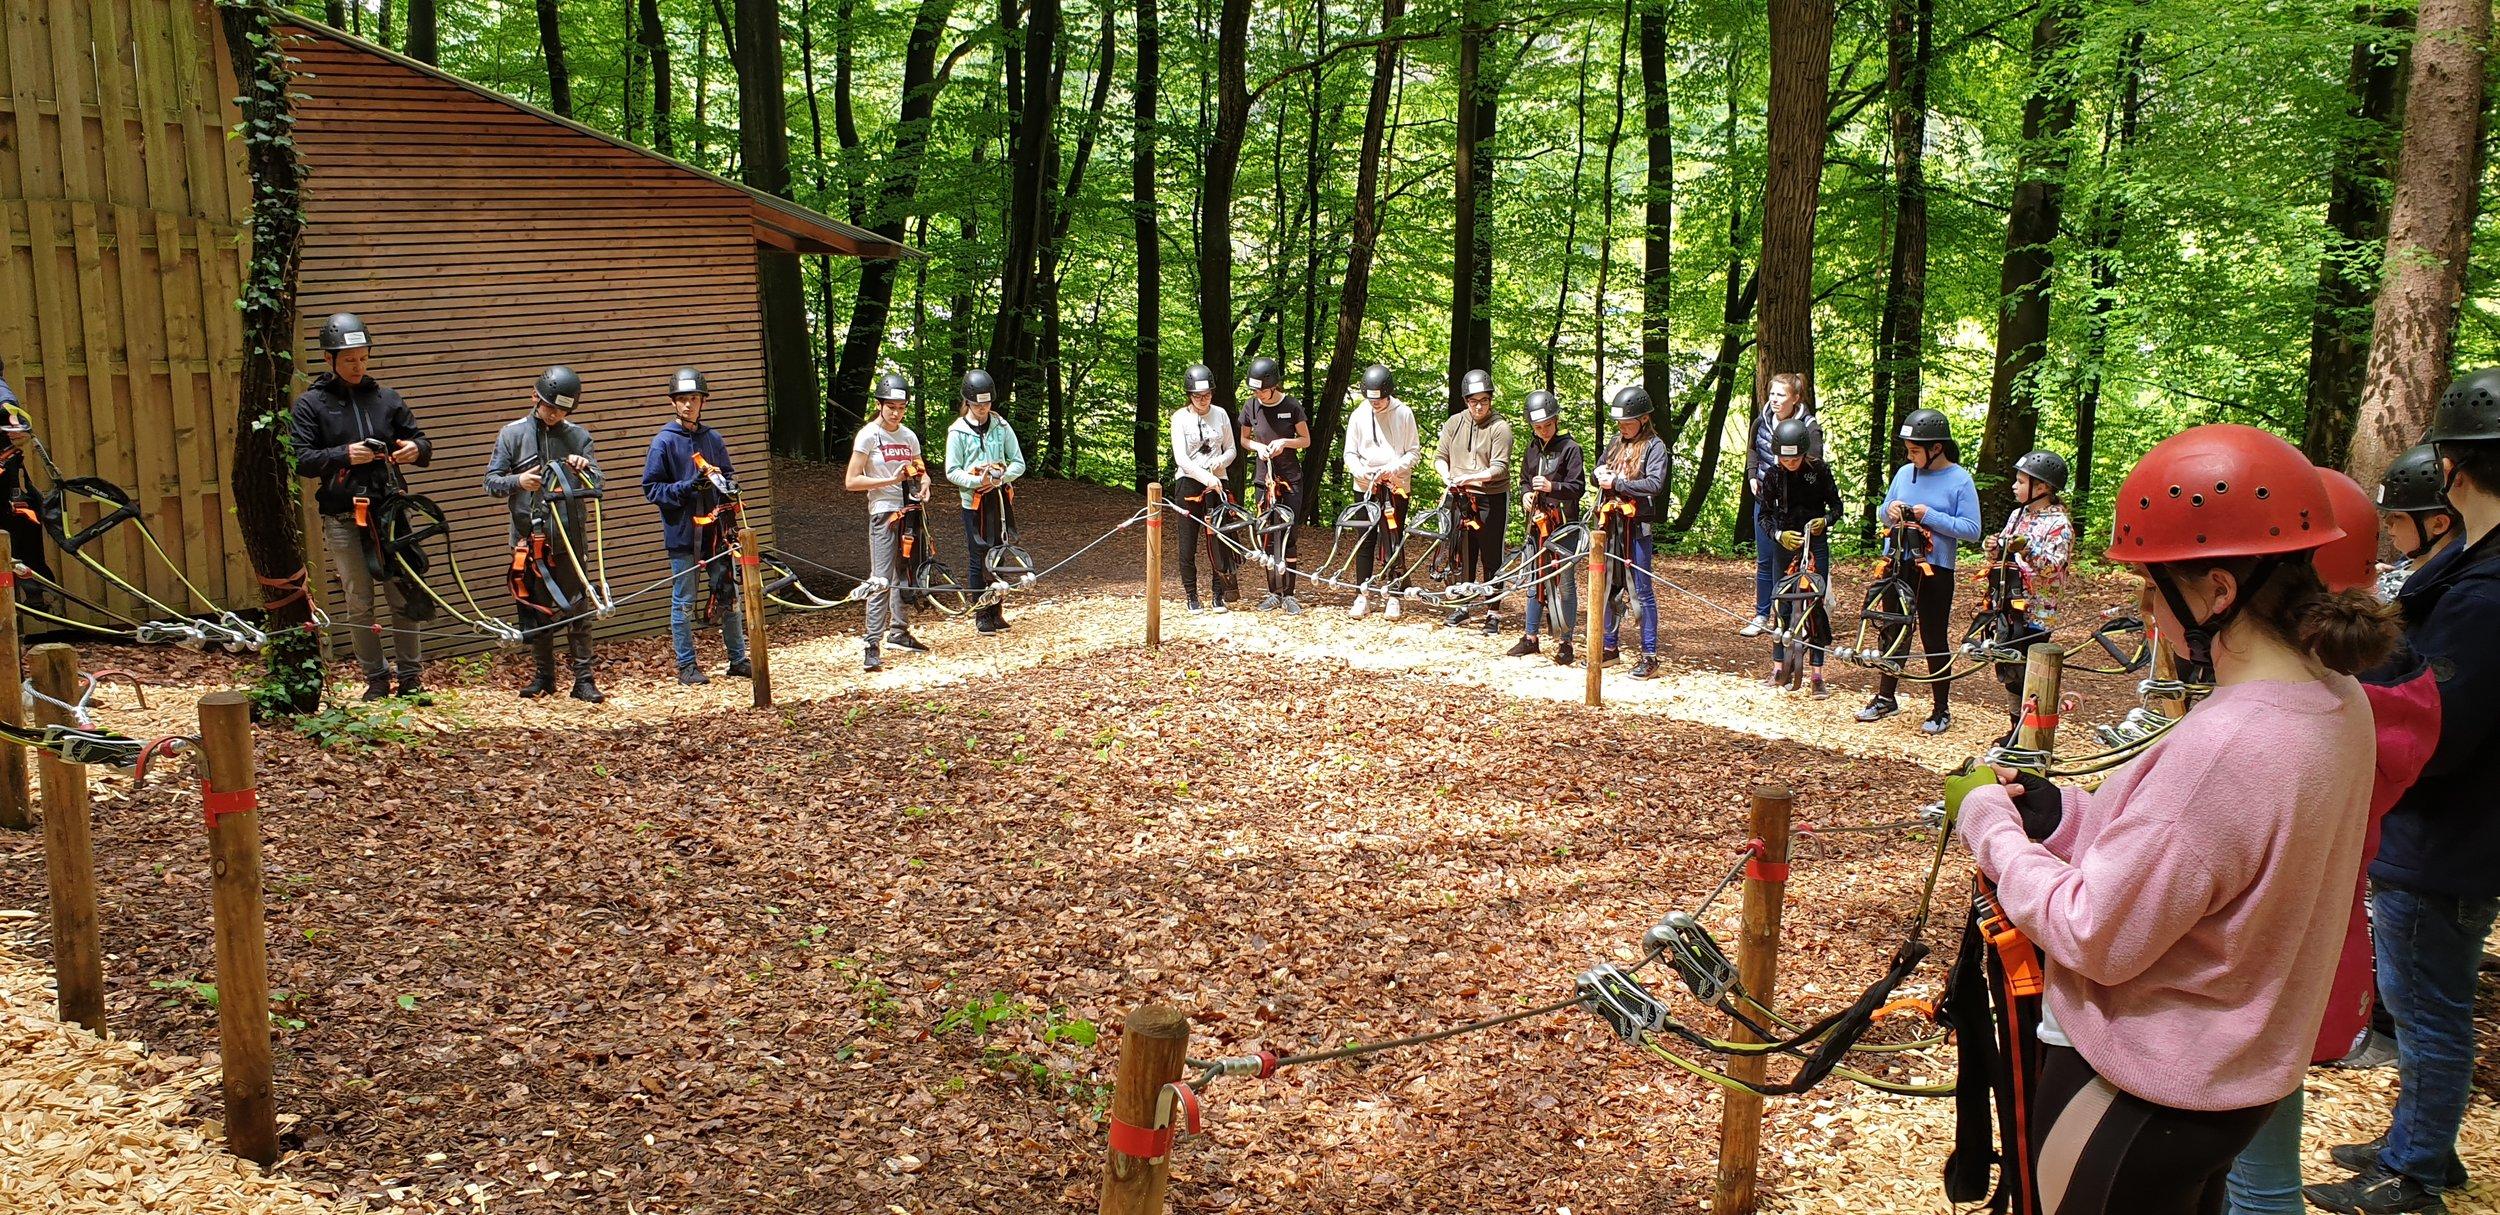 Kletterwald Foto 1.jpg